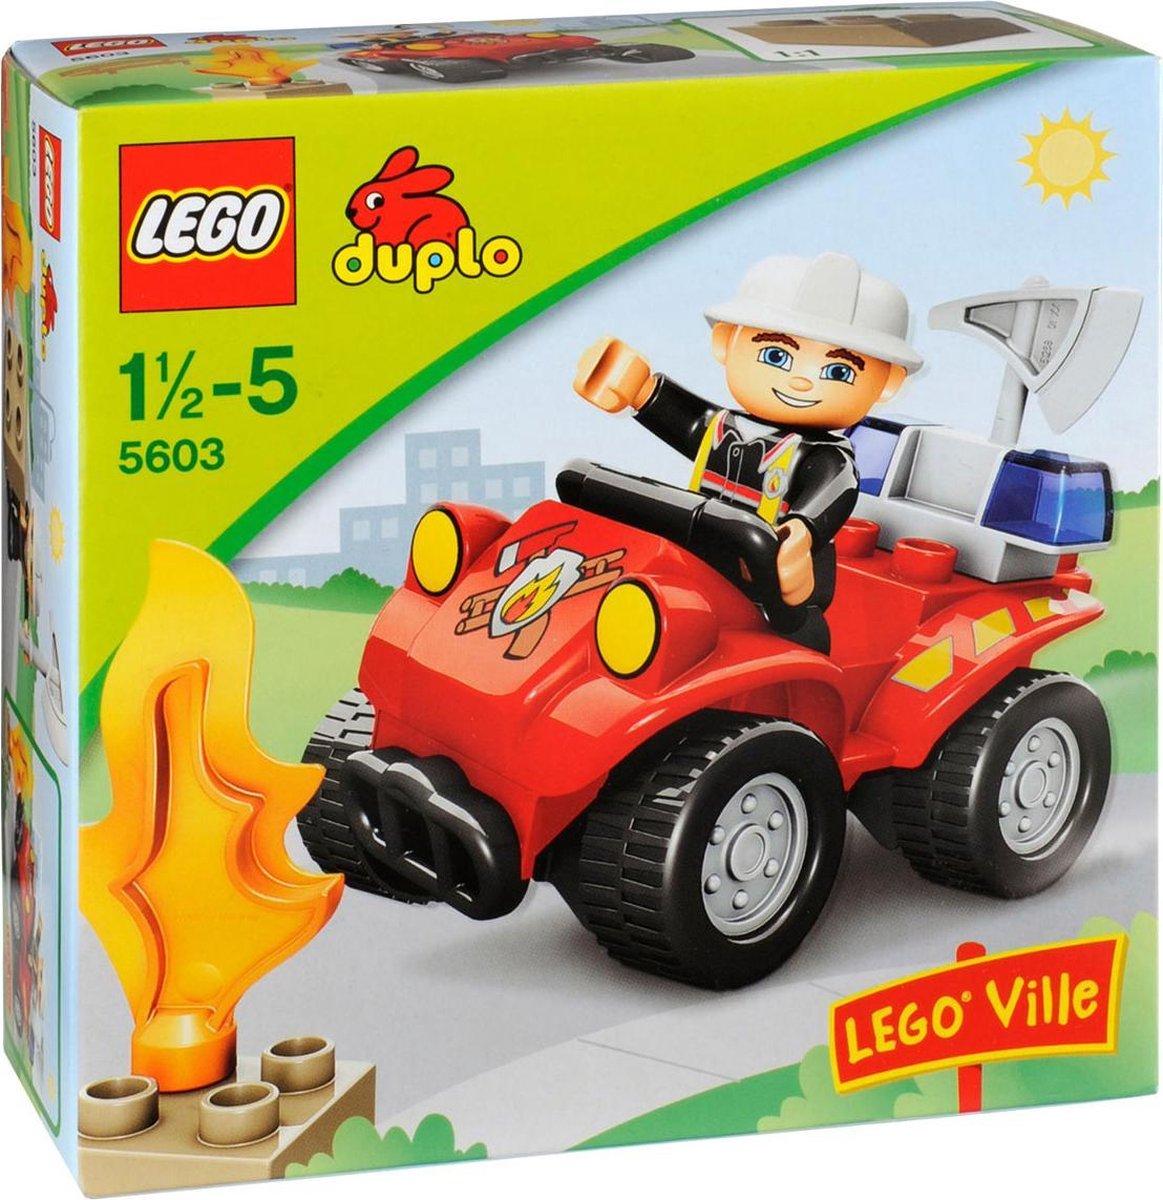 LEGO DUPLO Ville Brandweercommandant - 5603